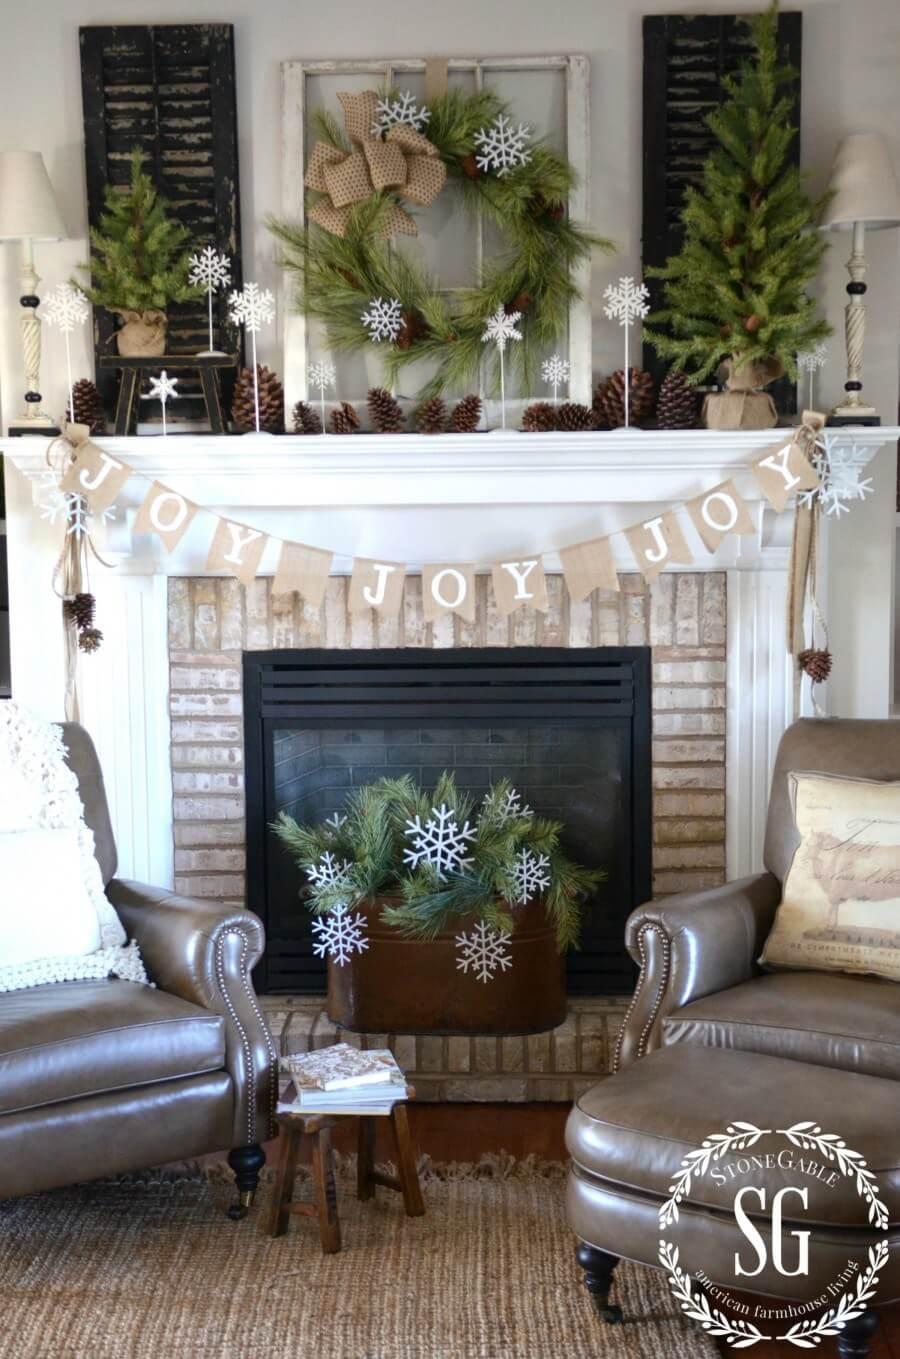 Snowflake and Pine Fireplace Decor